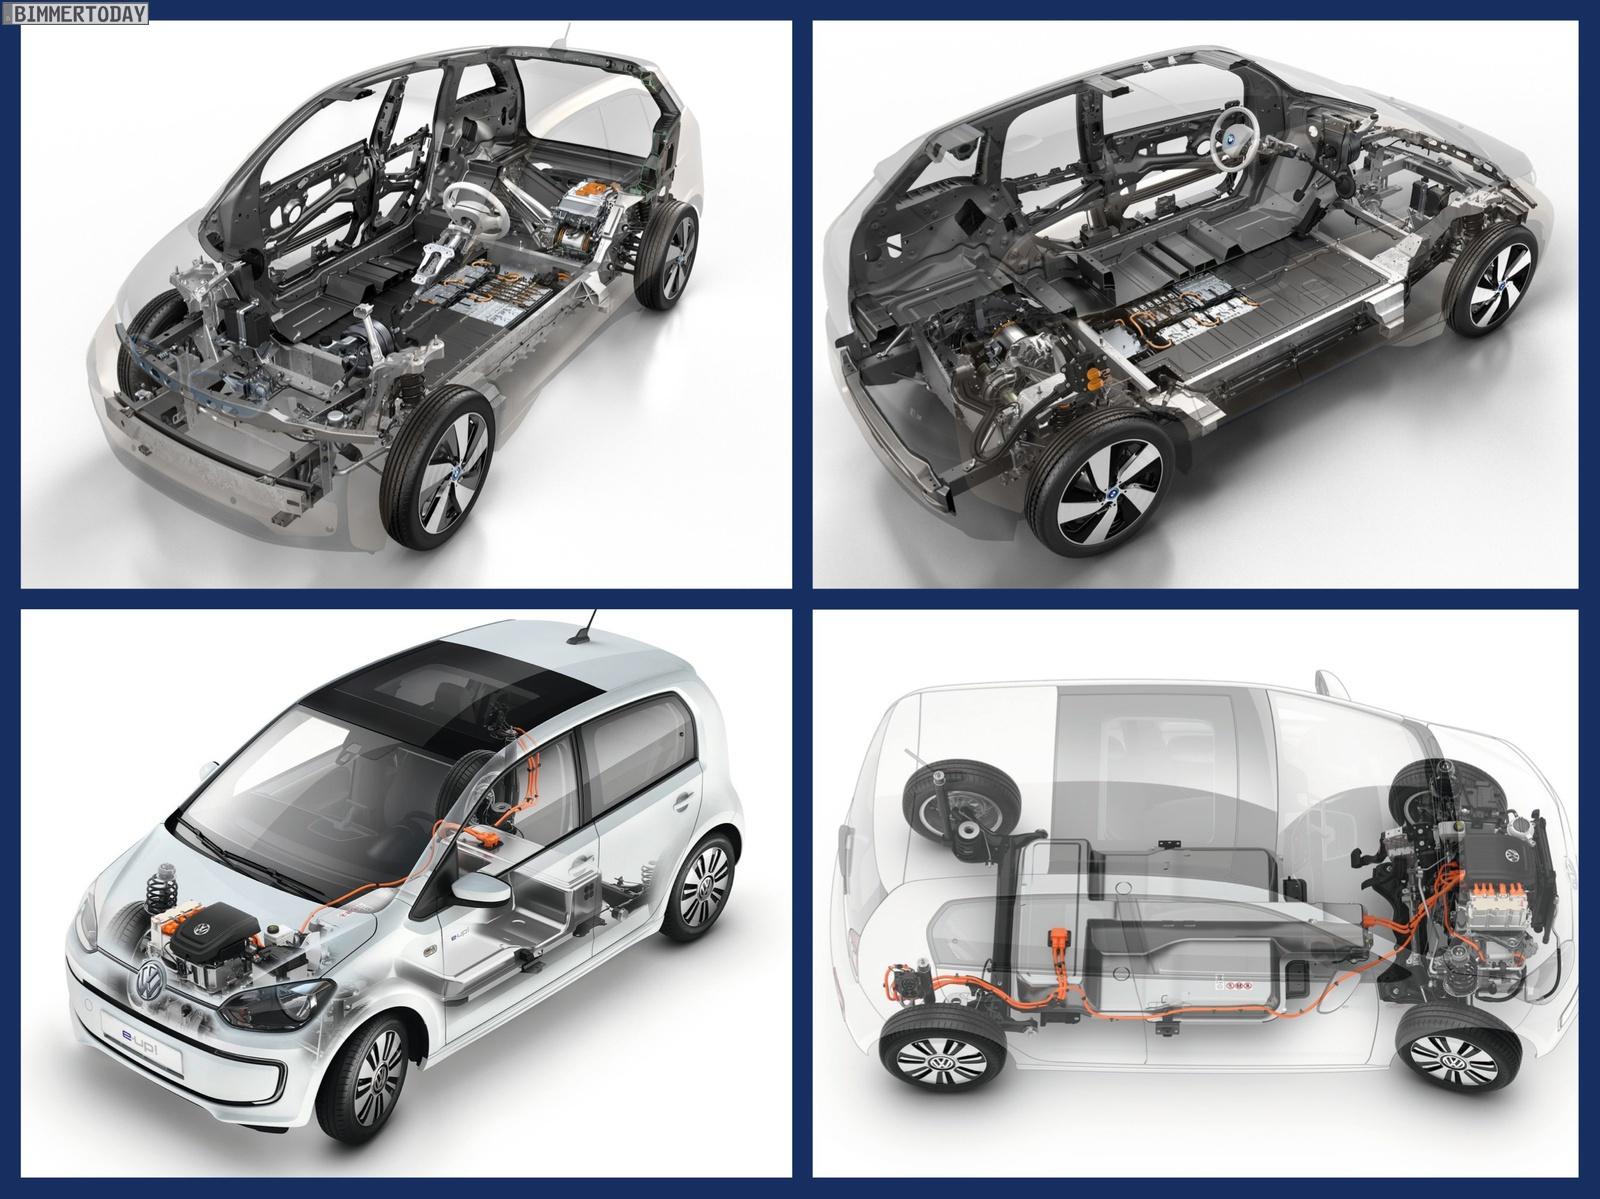 Bild Vergleich BMW i3 eDrive VW e Up 2013 06